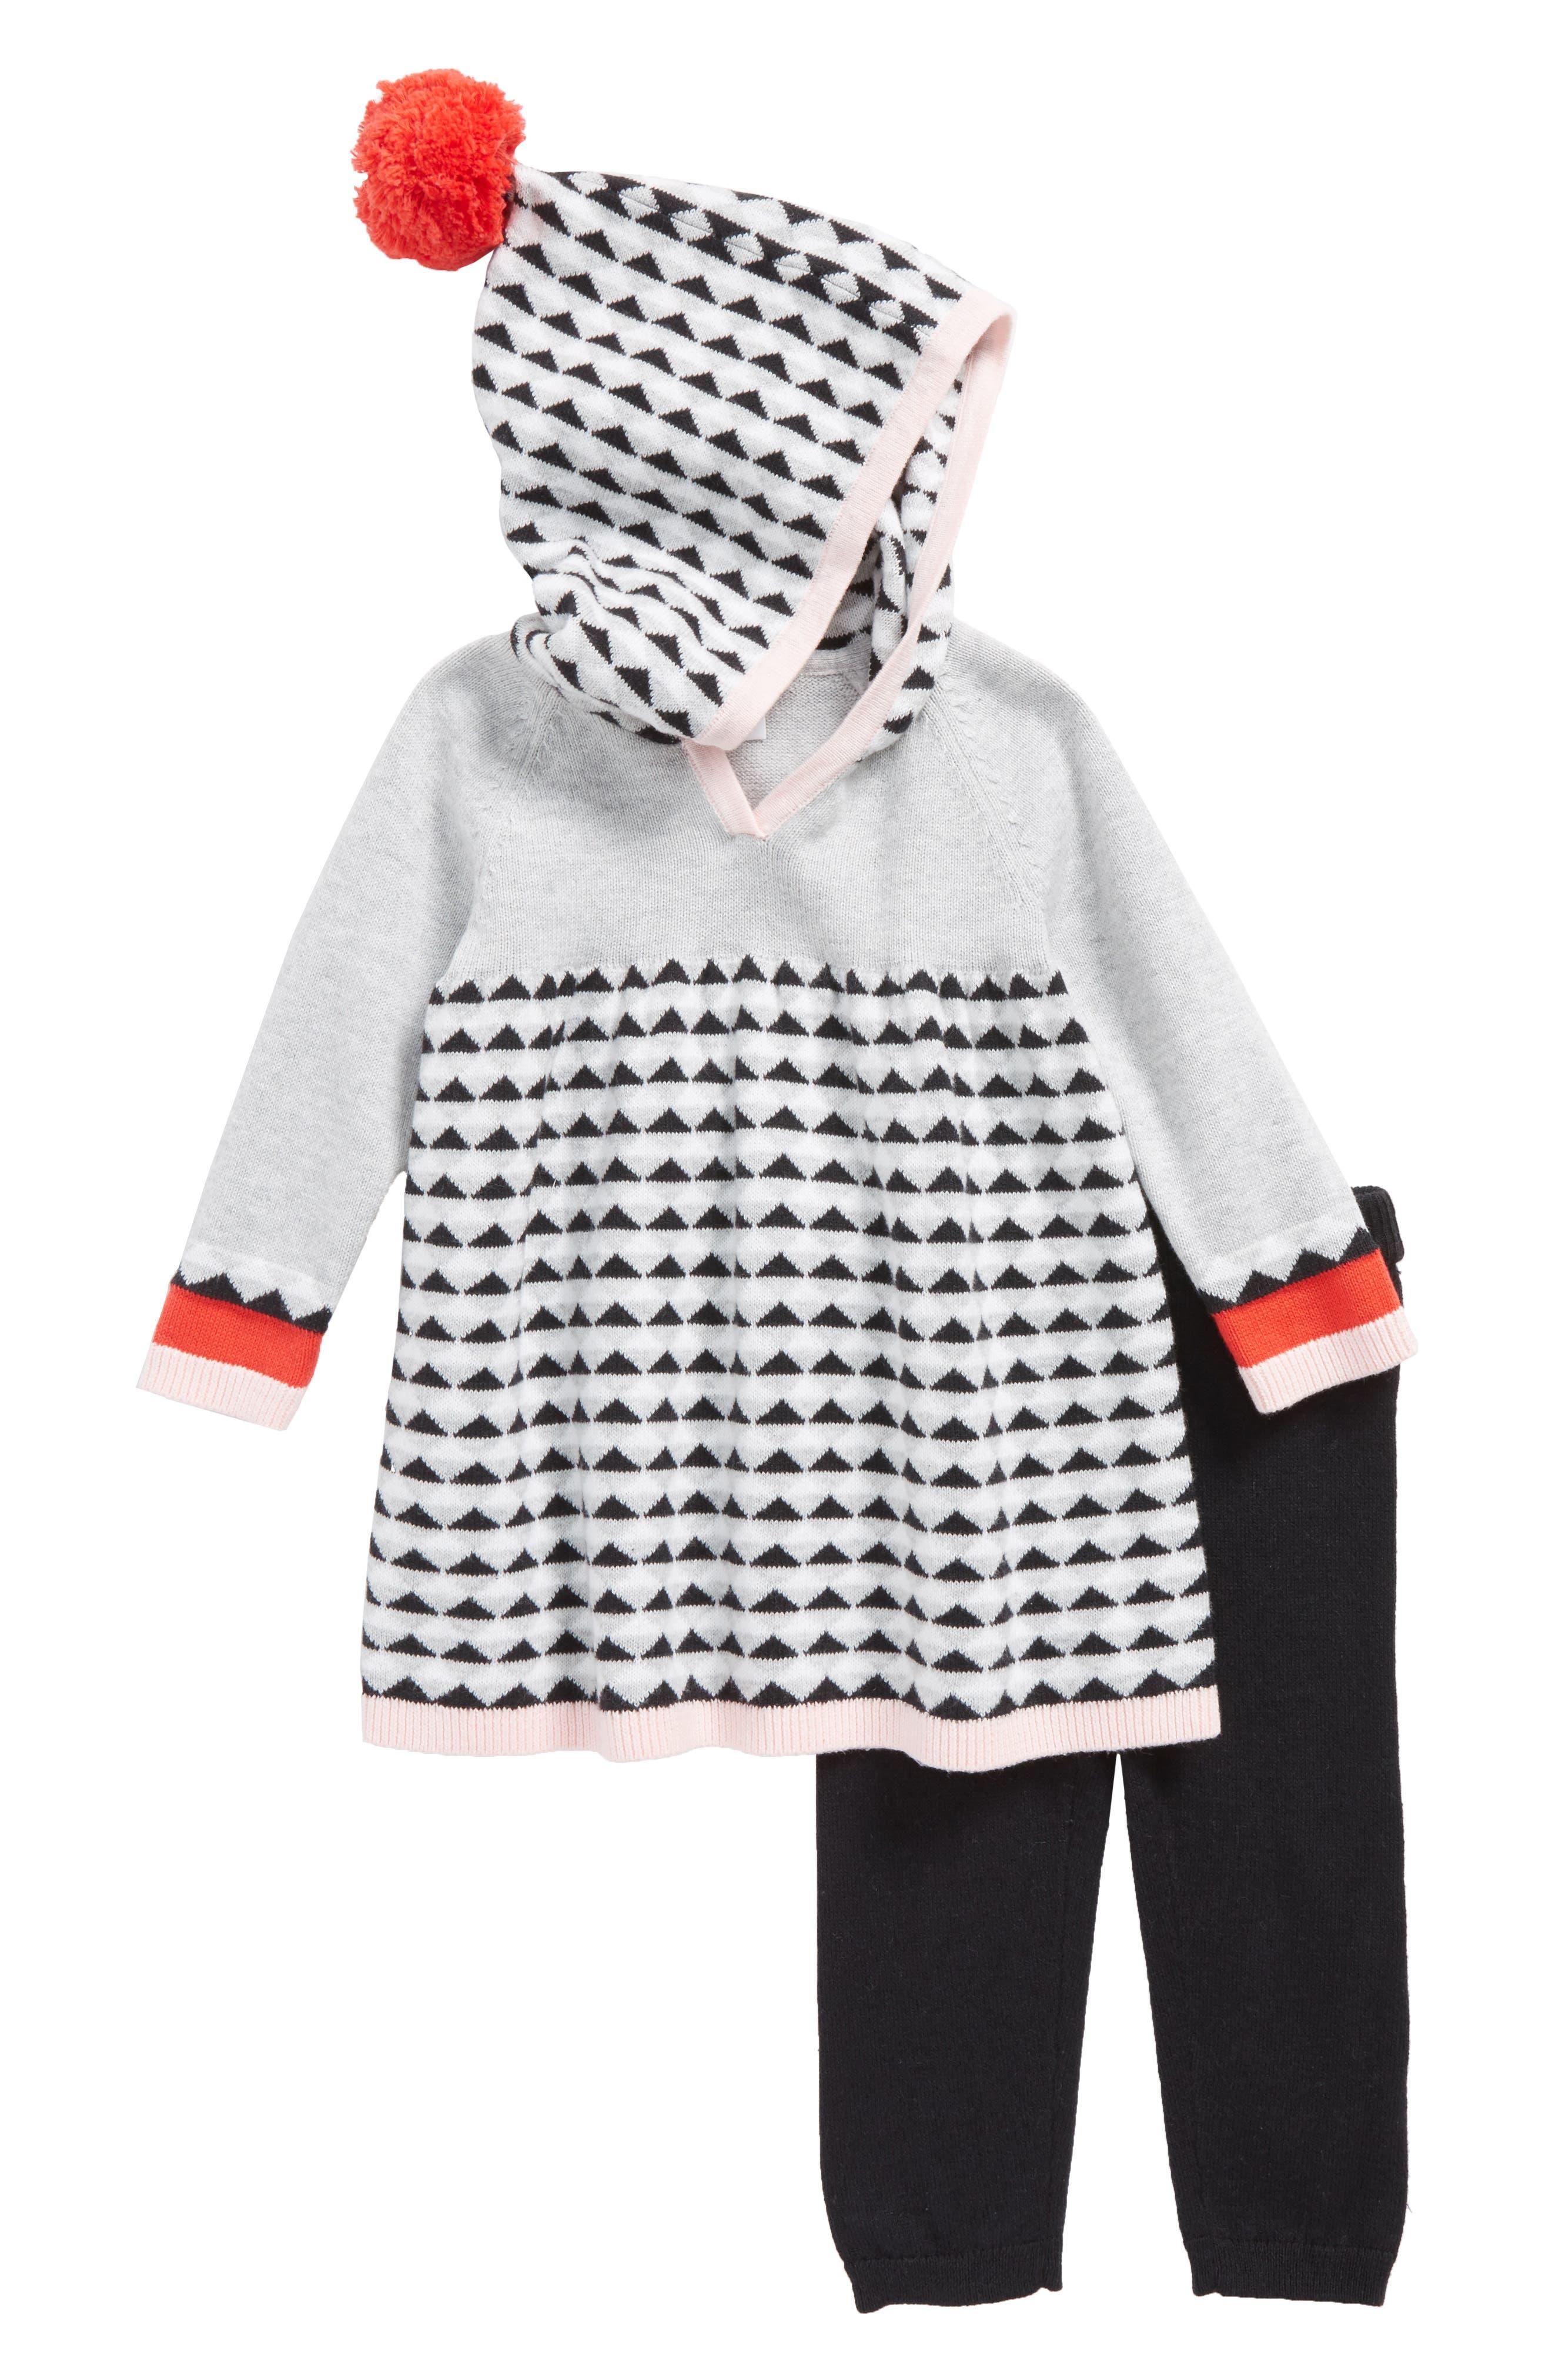 Main Image - Nordstrom Baby Hooded Sweater Dress & Leggings Set (Baby Girls)